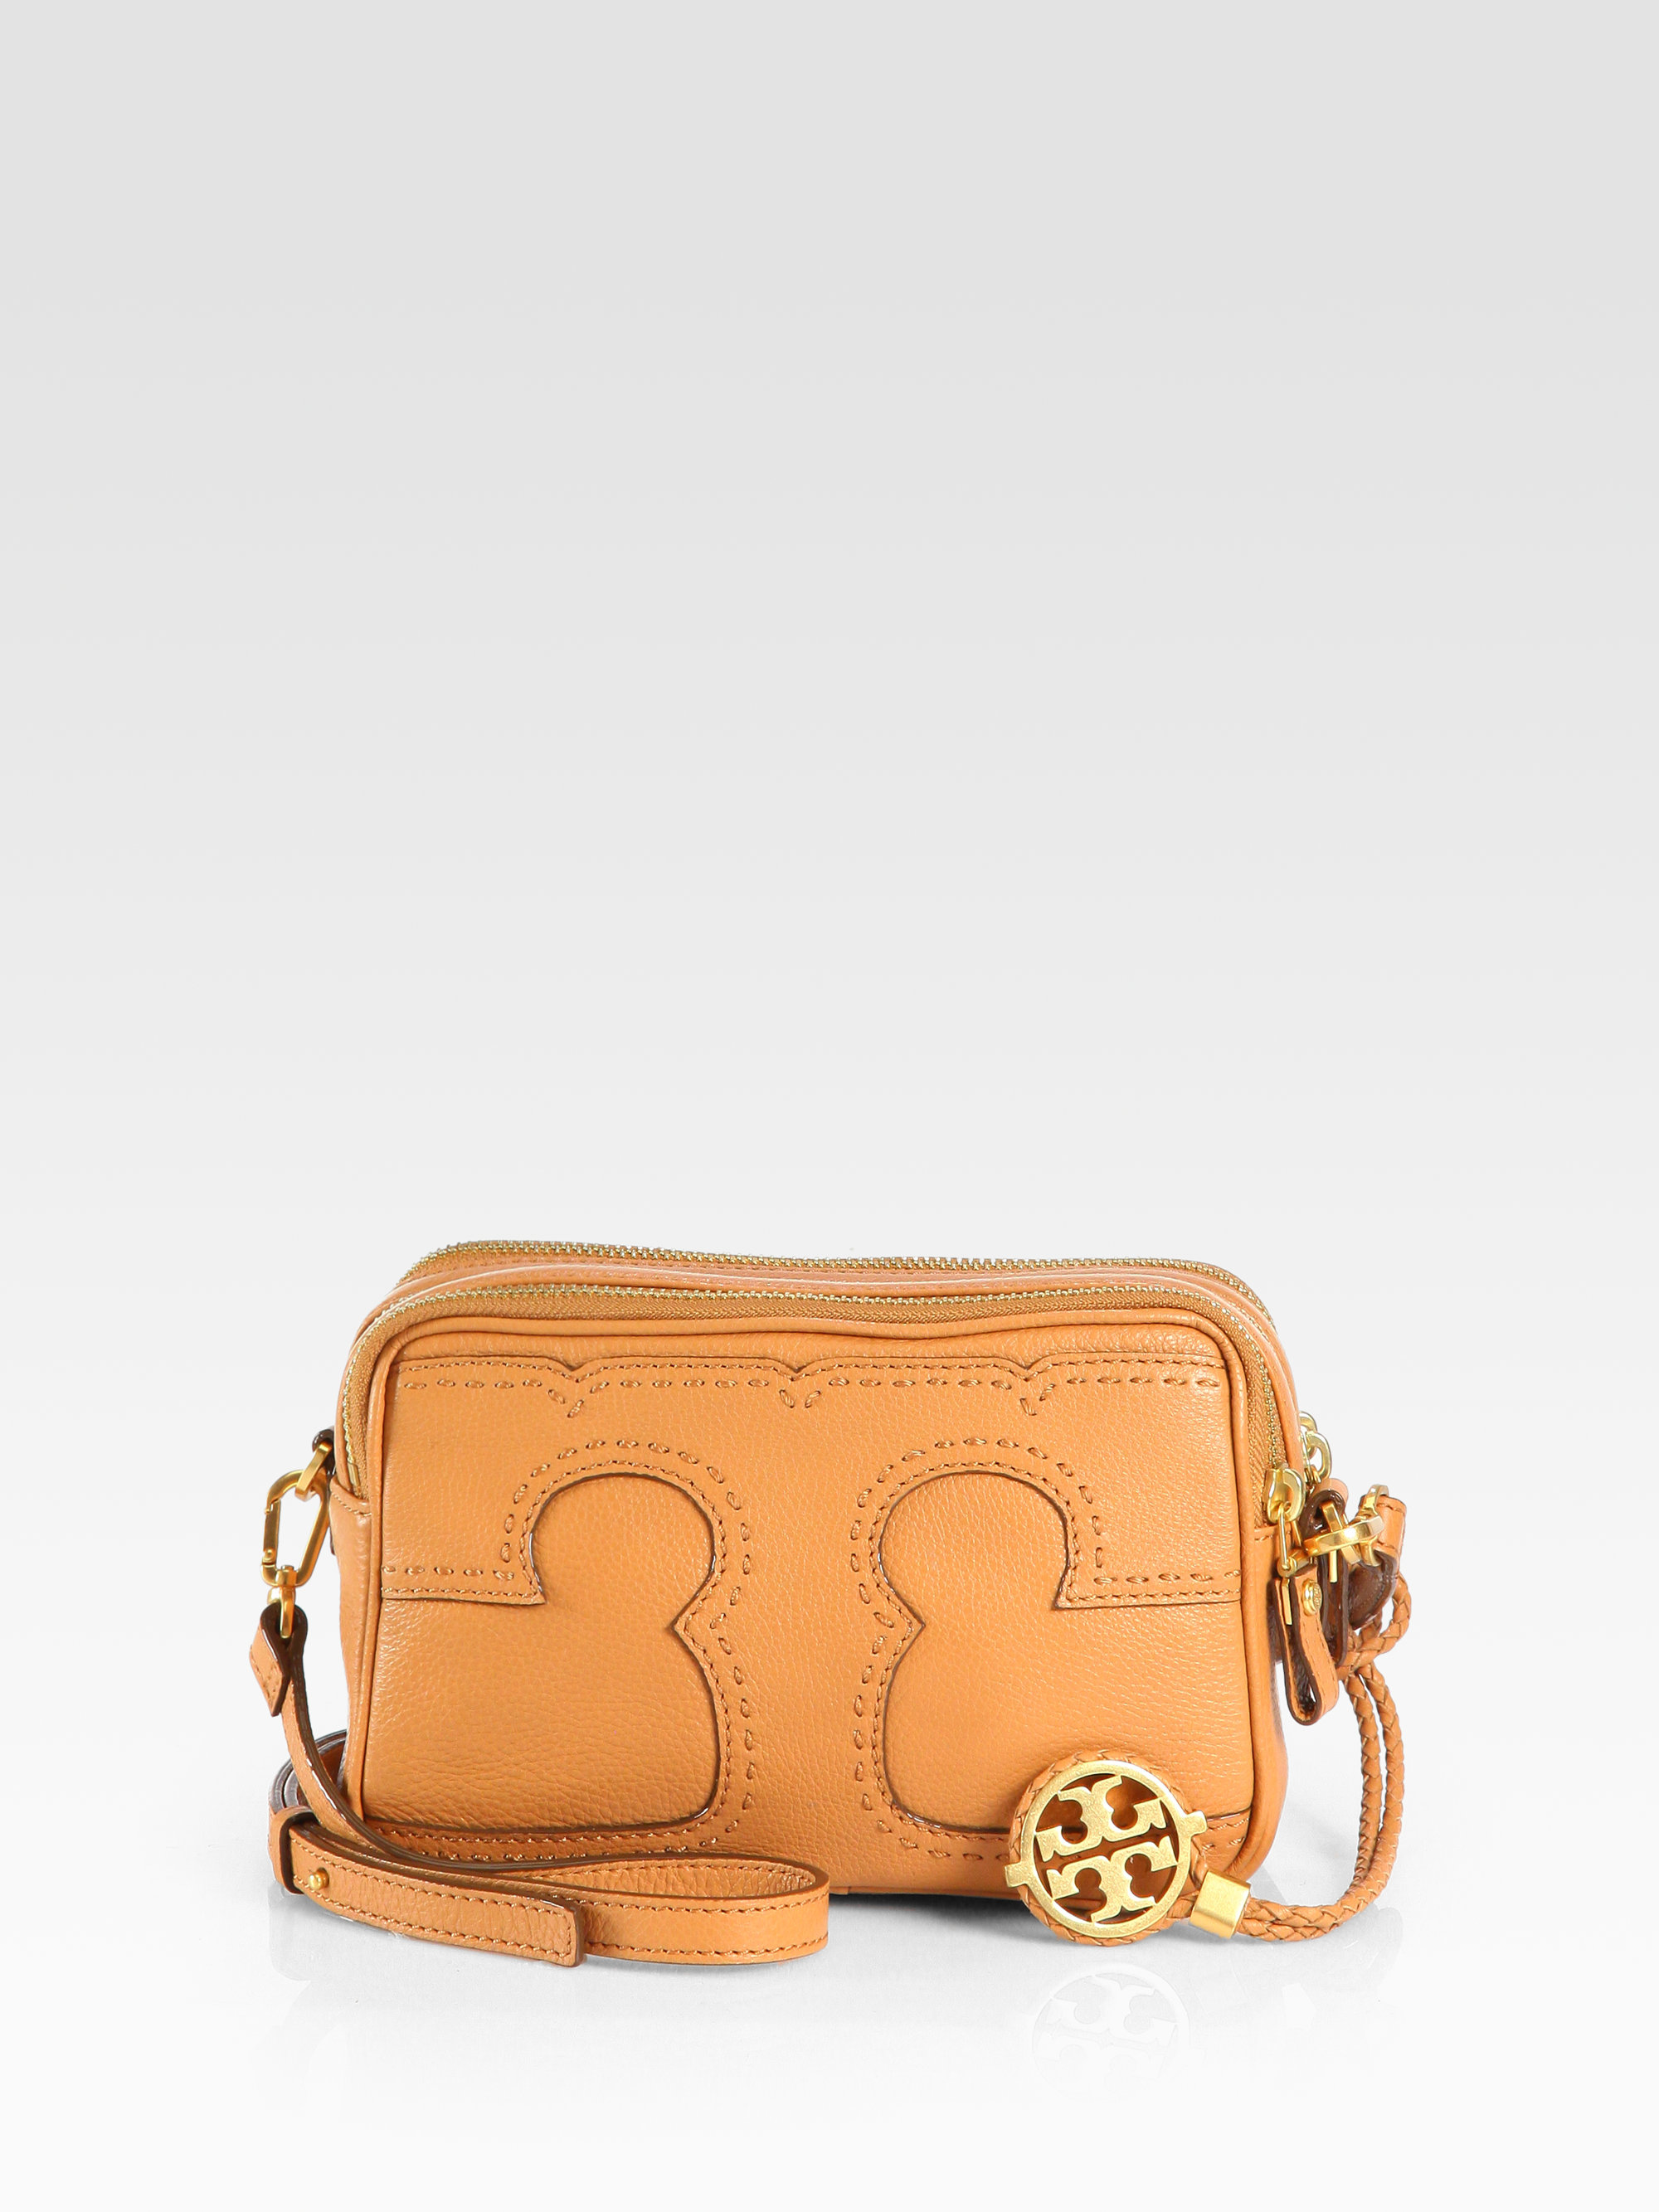 cf576d237a Tory Burch Amalie Emblem Mini Crossbody Bag in Brown - Lyst